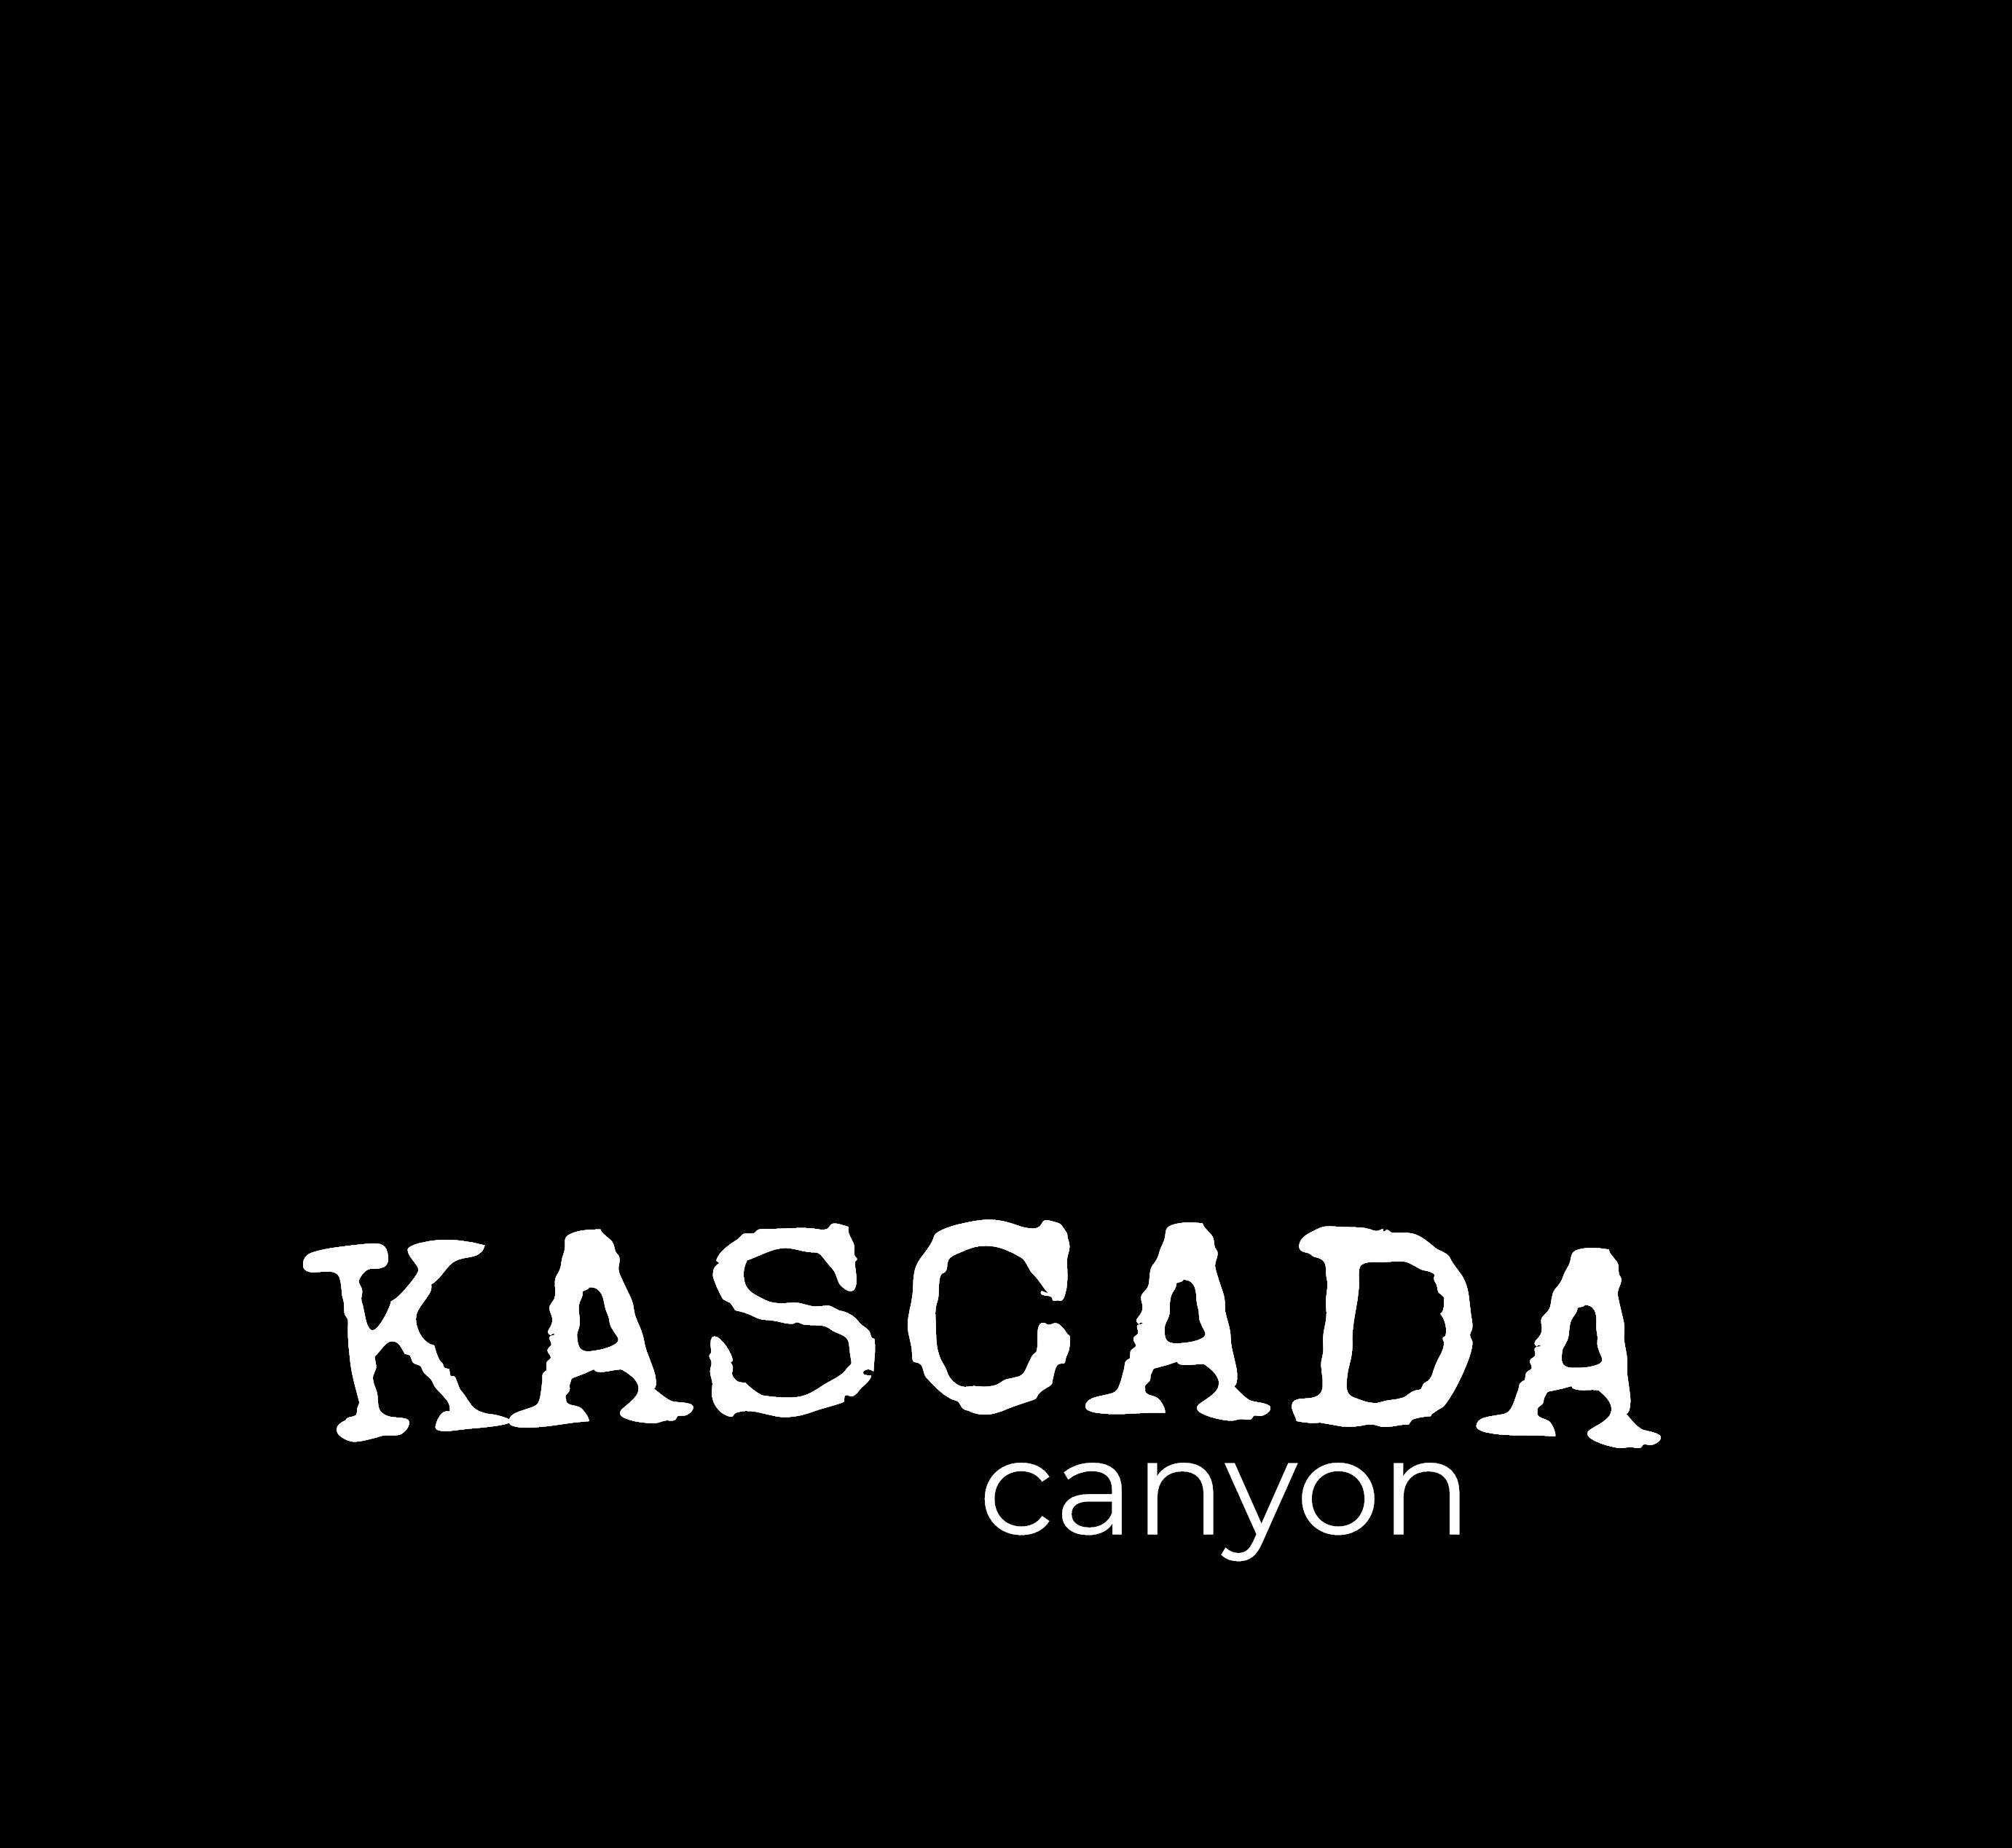 Kascada